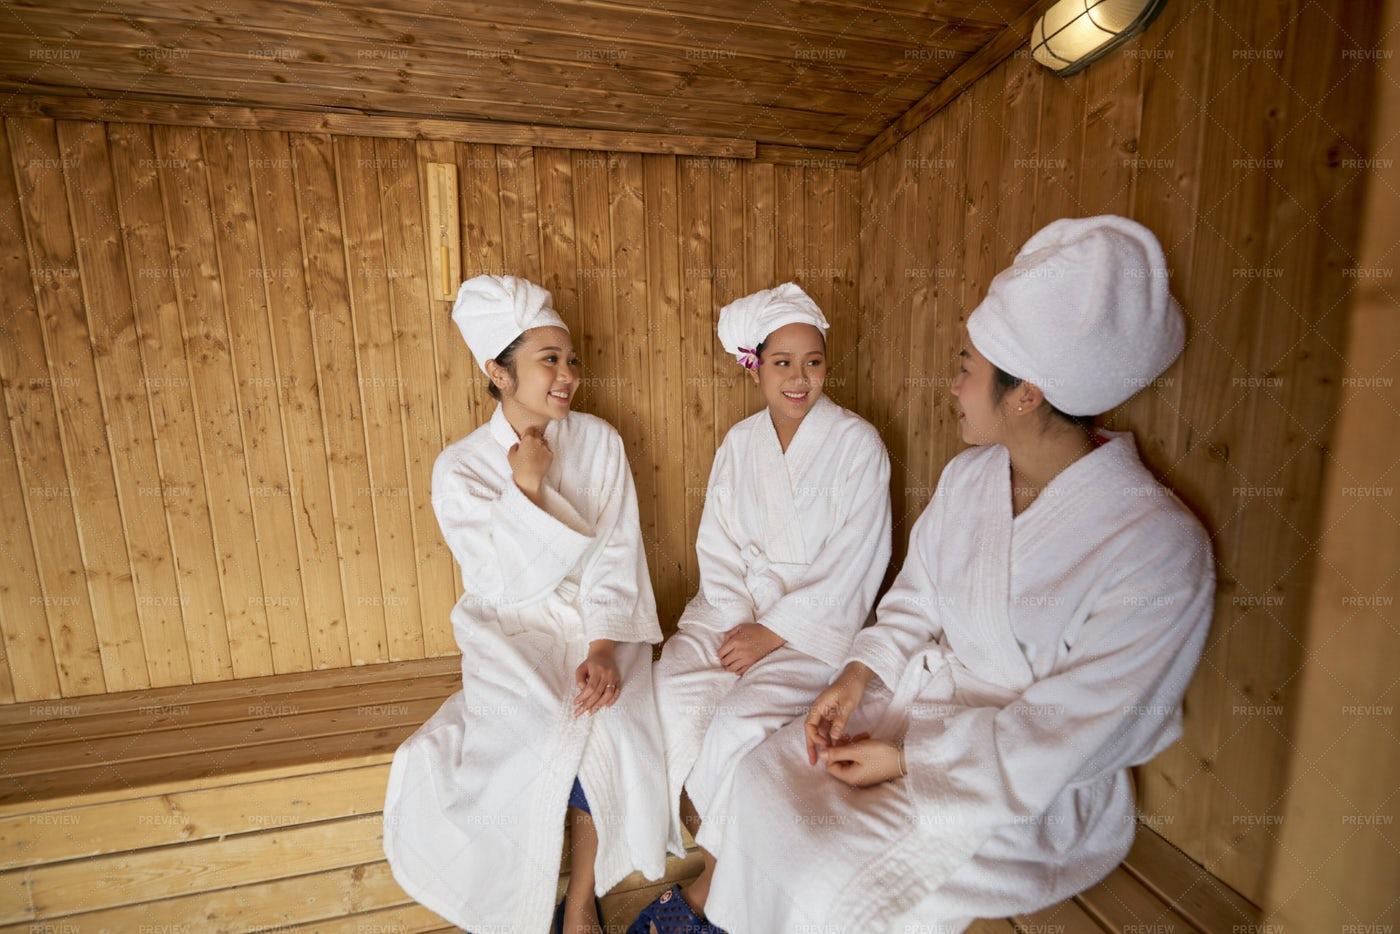 Group Of Women Relaxing In Sauna: Stock Photos